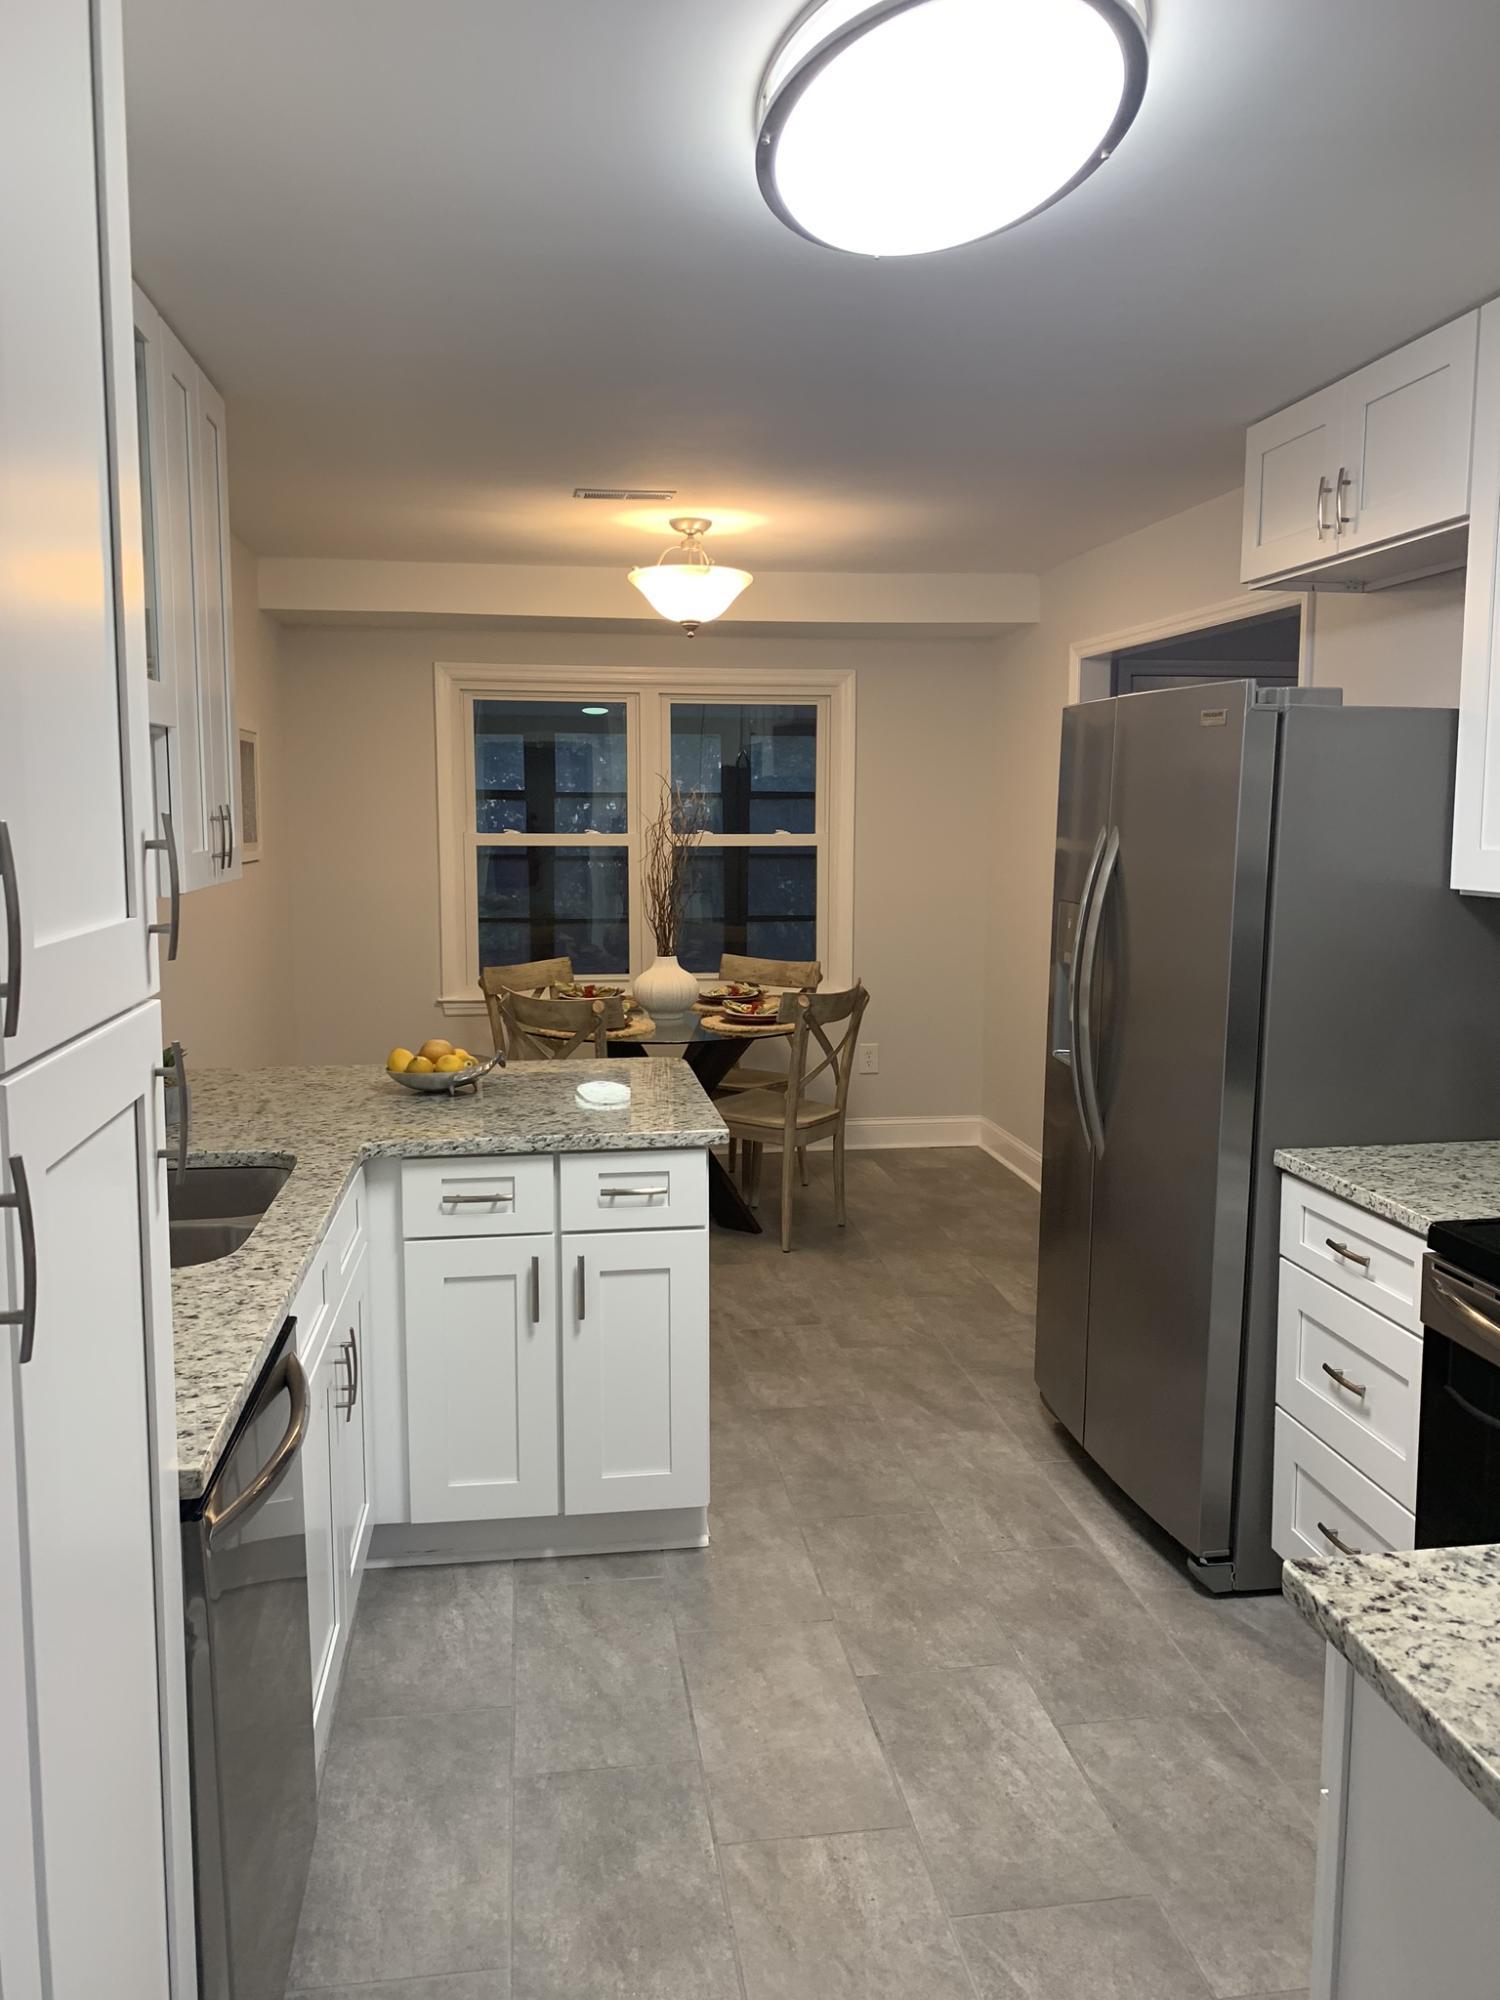 Heathwood Ext Homes For Sale - 2 Blaine, Charleston, SC - 1